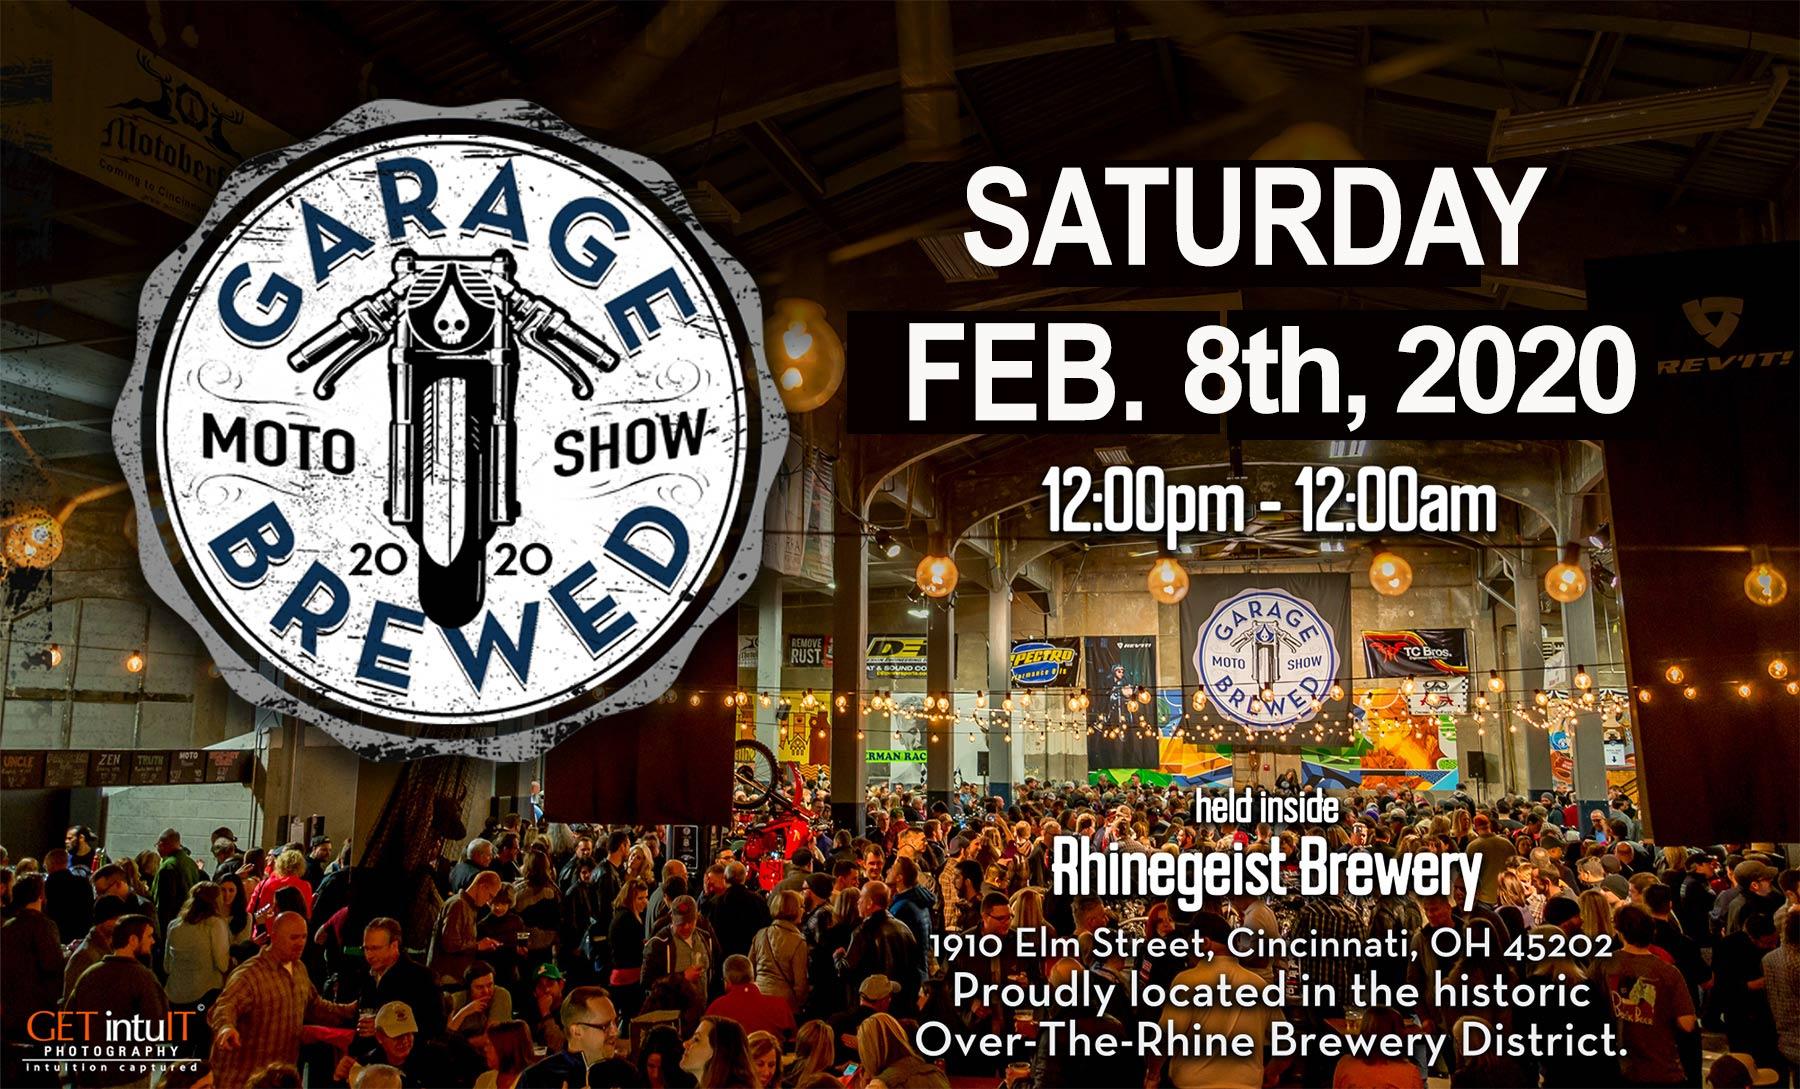 Saturday Feb 8th 2020